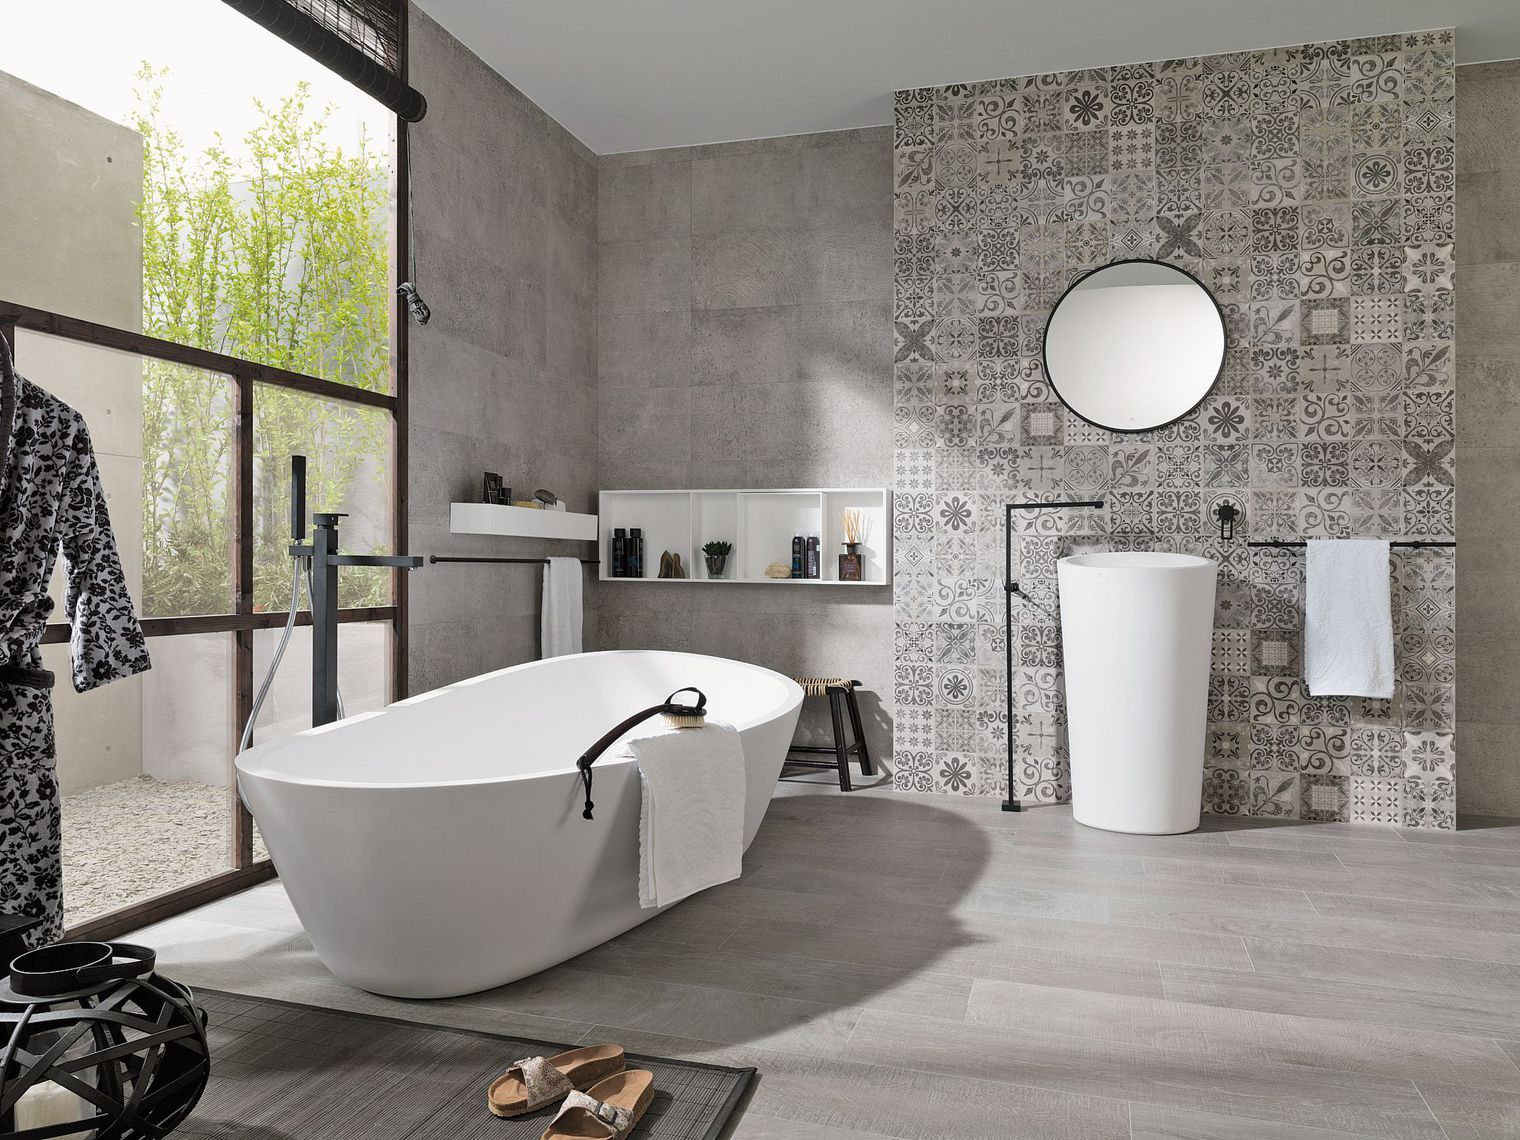 salle bain avec carrelage noir tag vvcom hexagonal motif. Black Bedroom Furniture Sets. Home Design Ideas